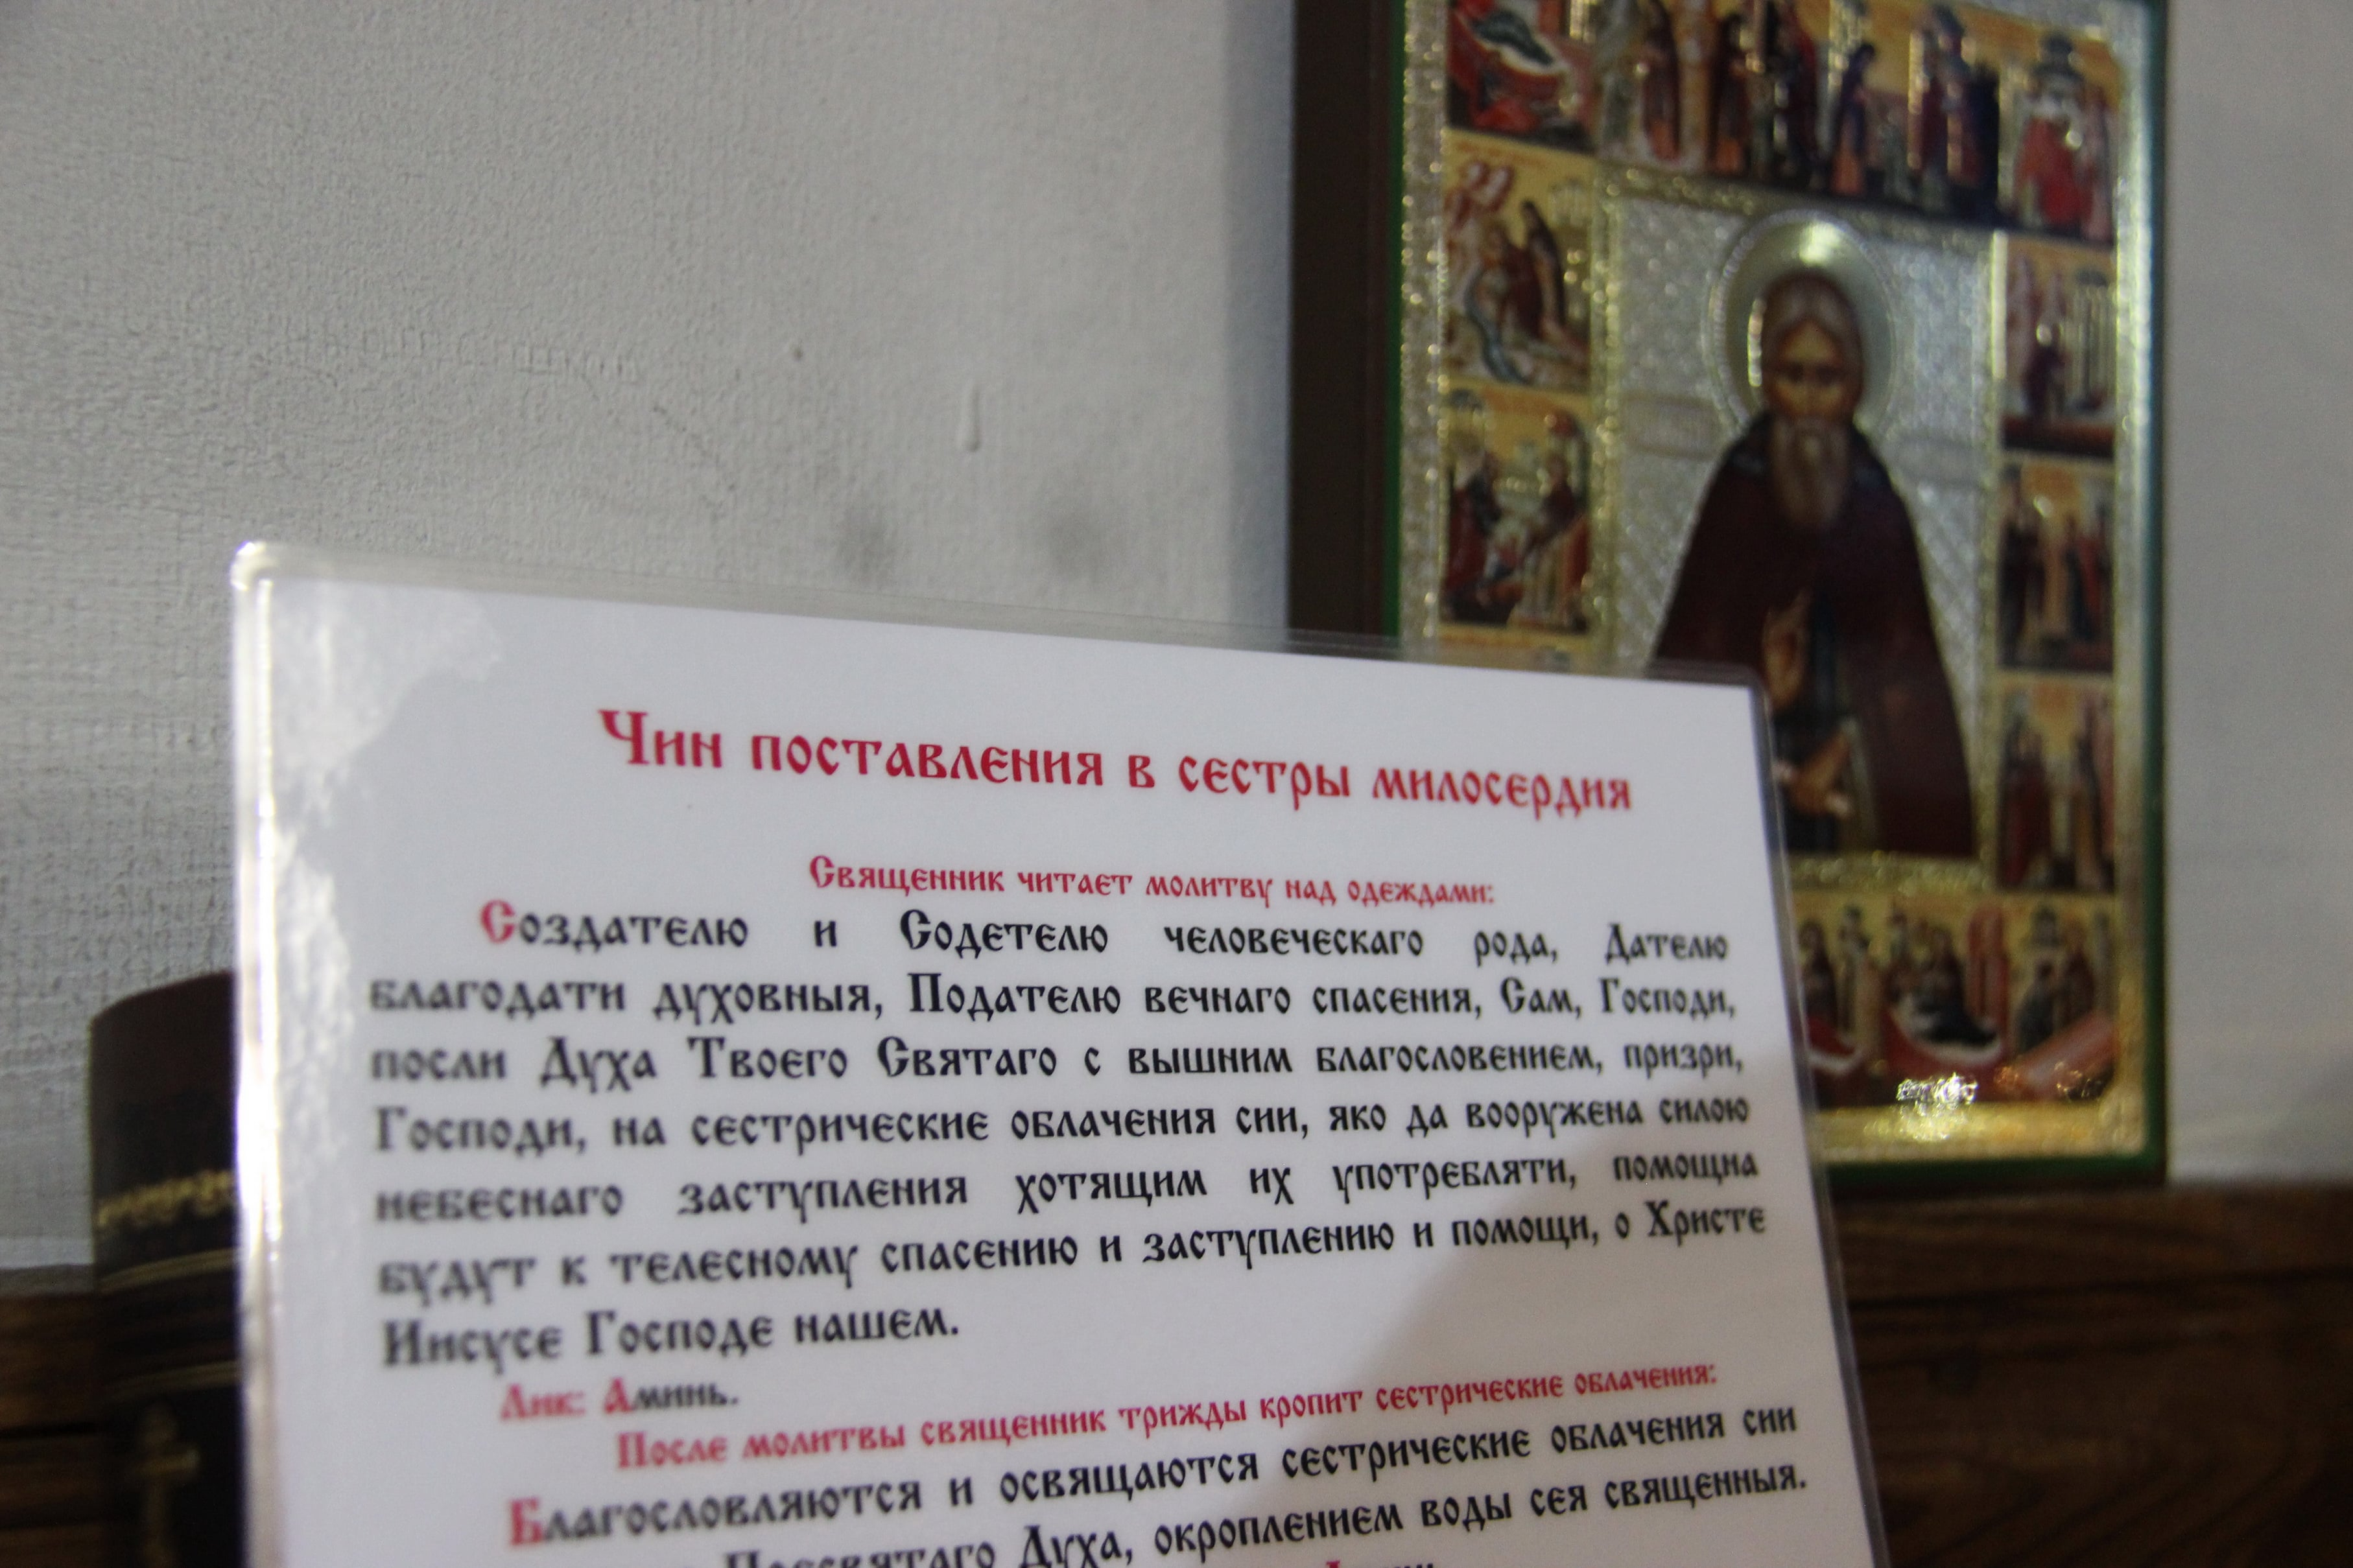 http://monuspen.ru/photoreports/e378941596179341346f1391ec95b2b3.JPG